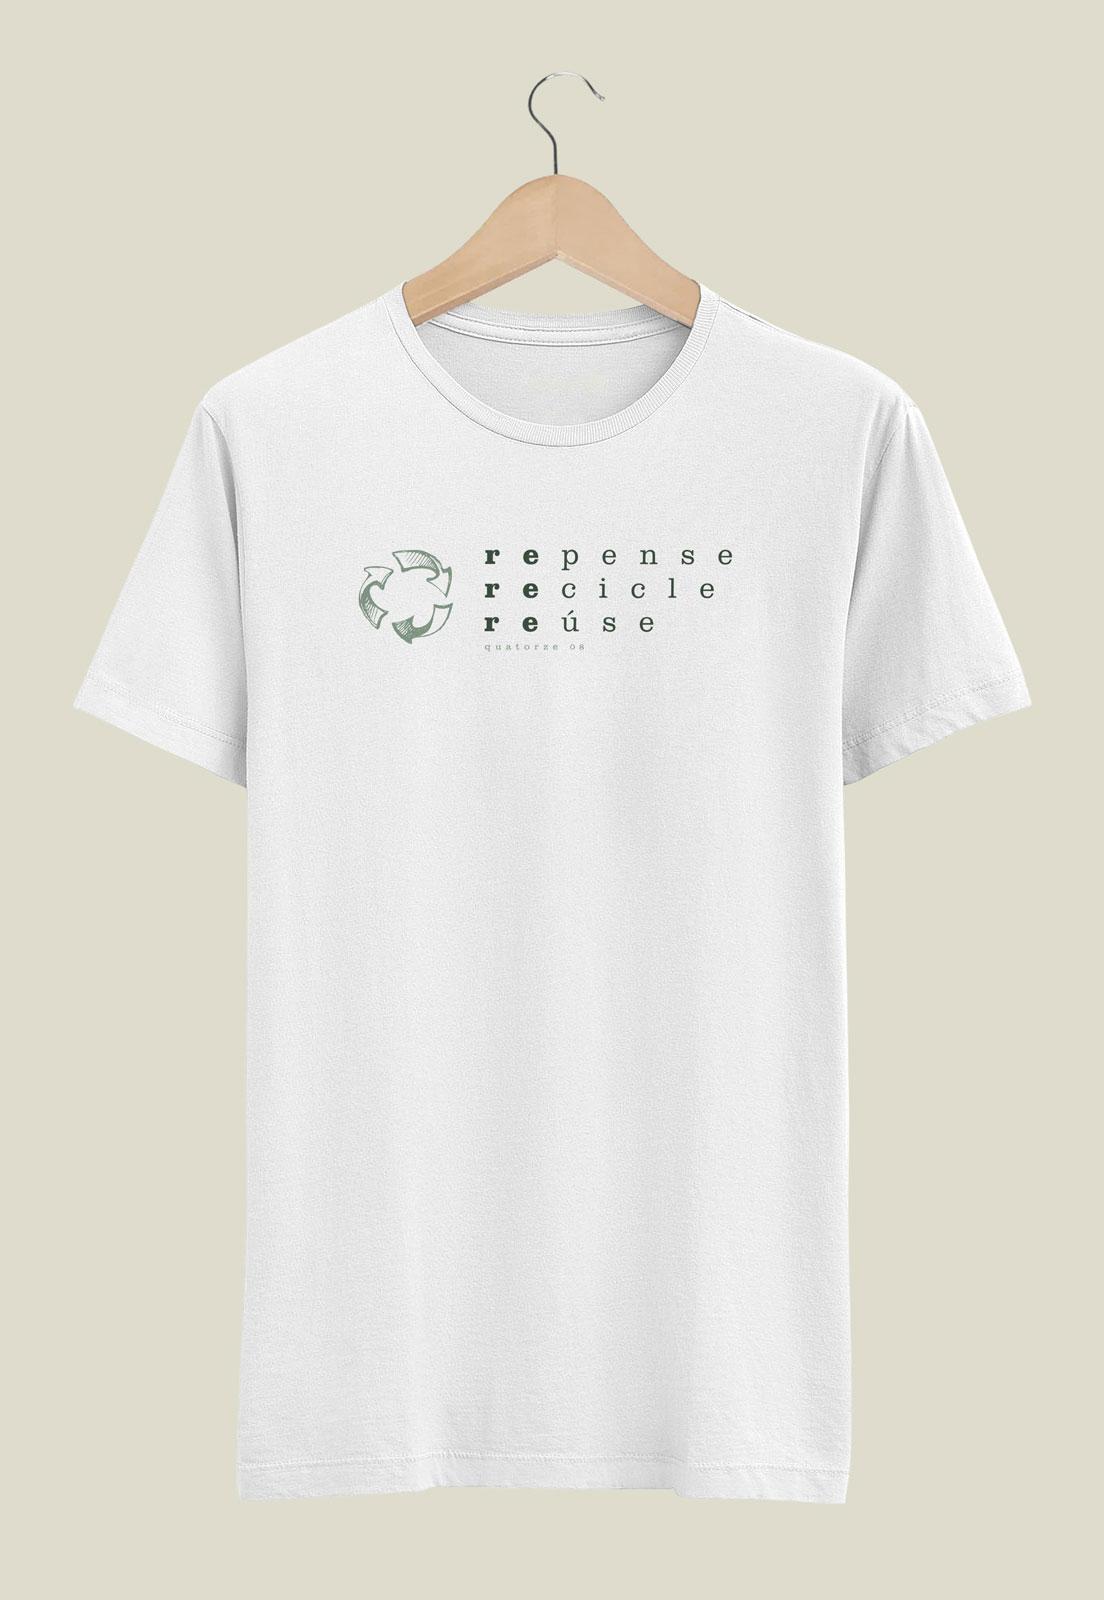 Camiseta Repense Recicle Reuse Branca